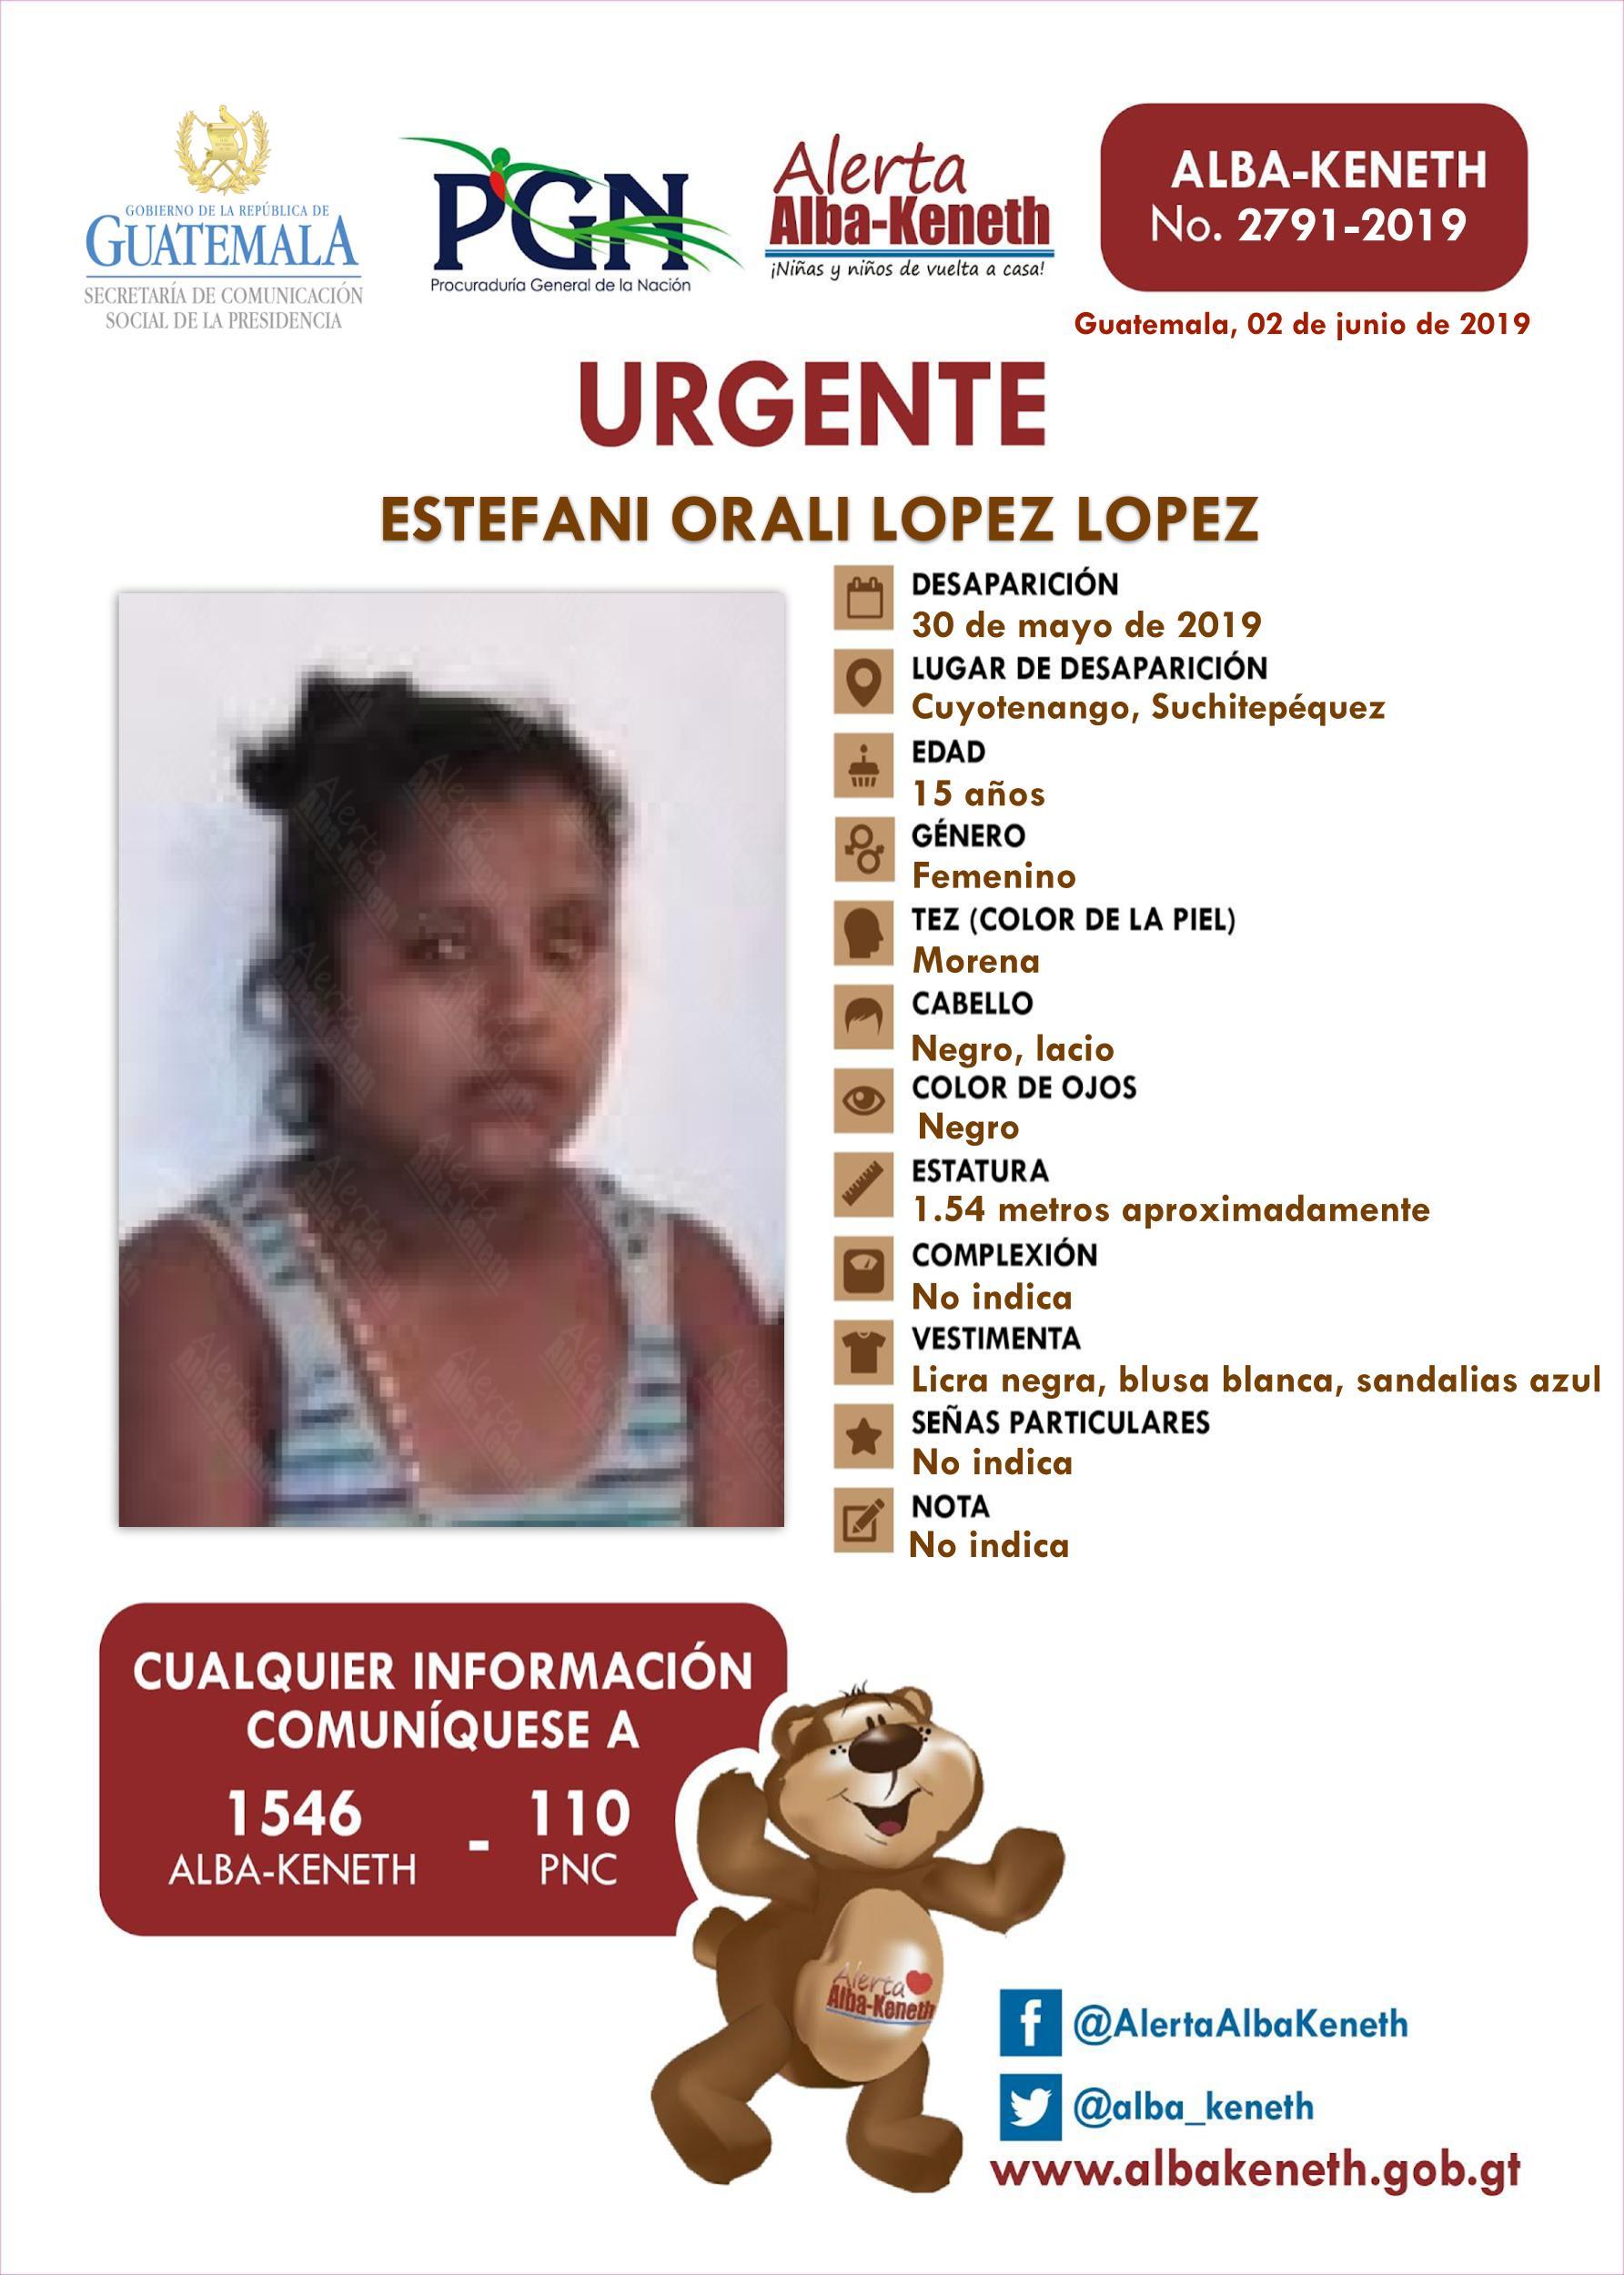 Estefani Orali Lopez Lopez